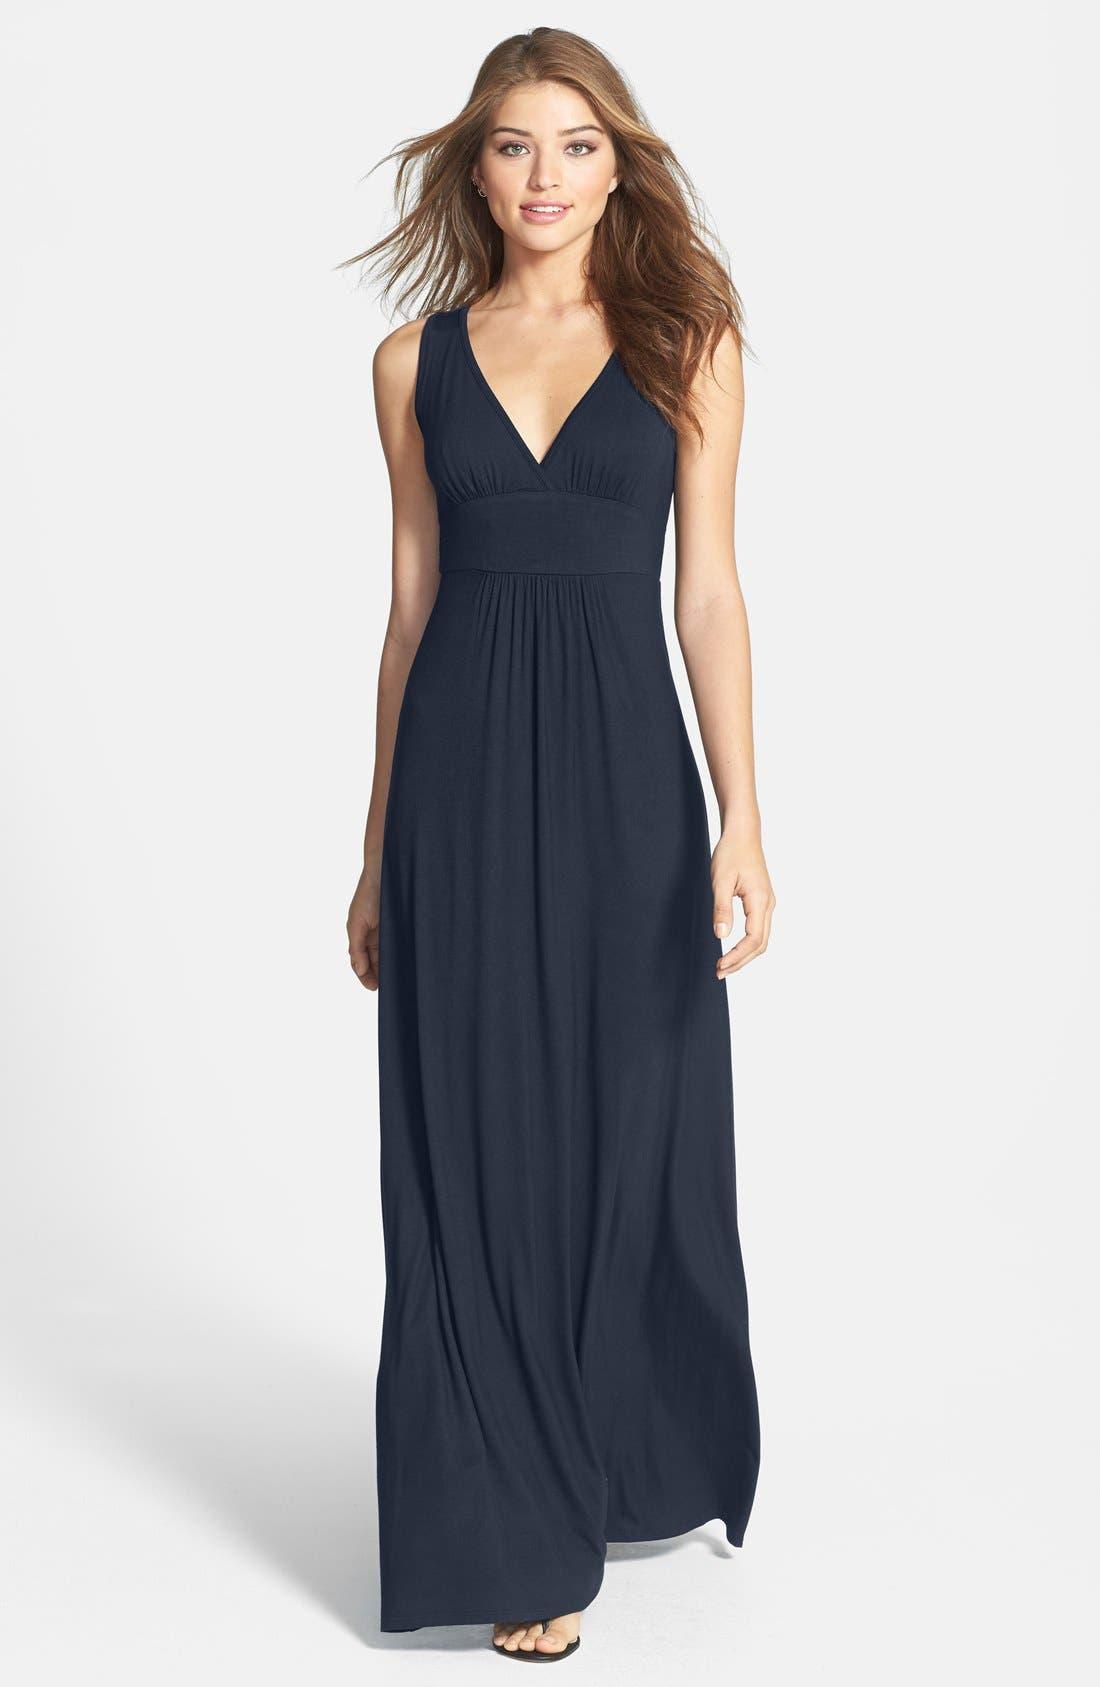 Women's Maxi Dresses | Nordstrom